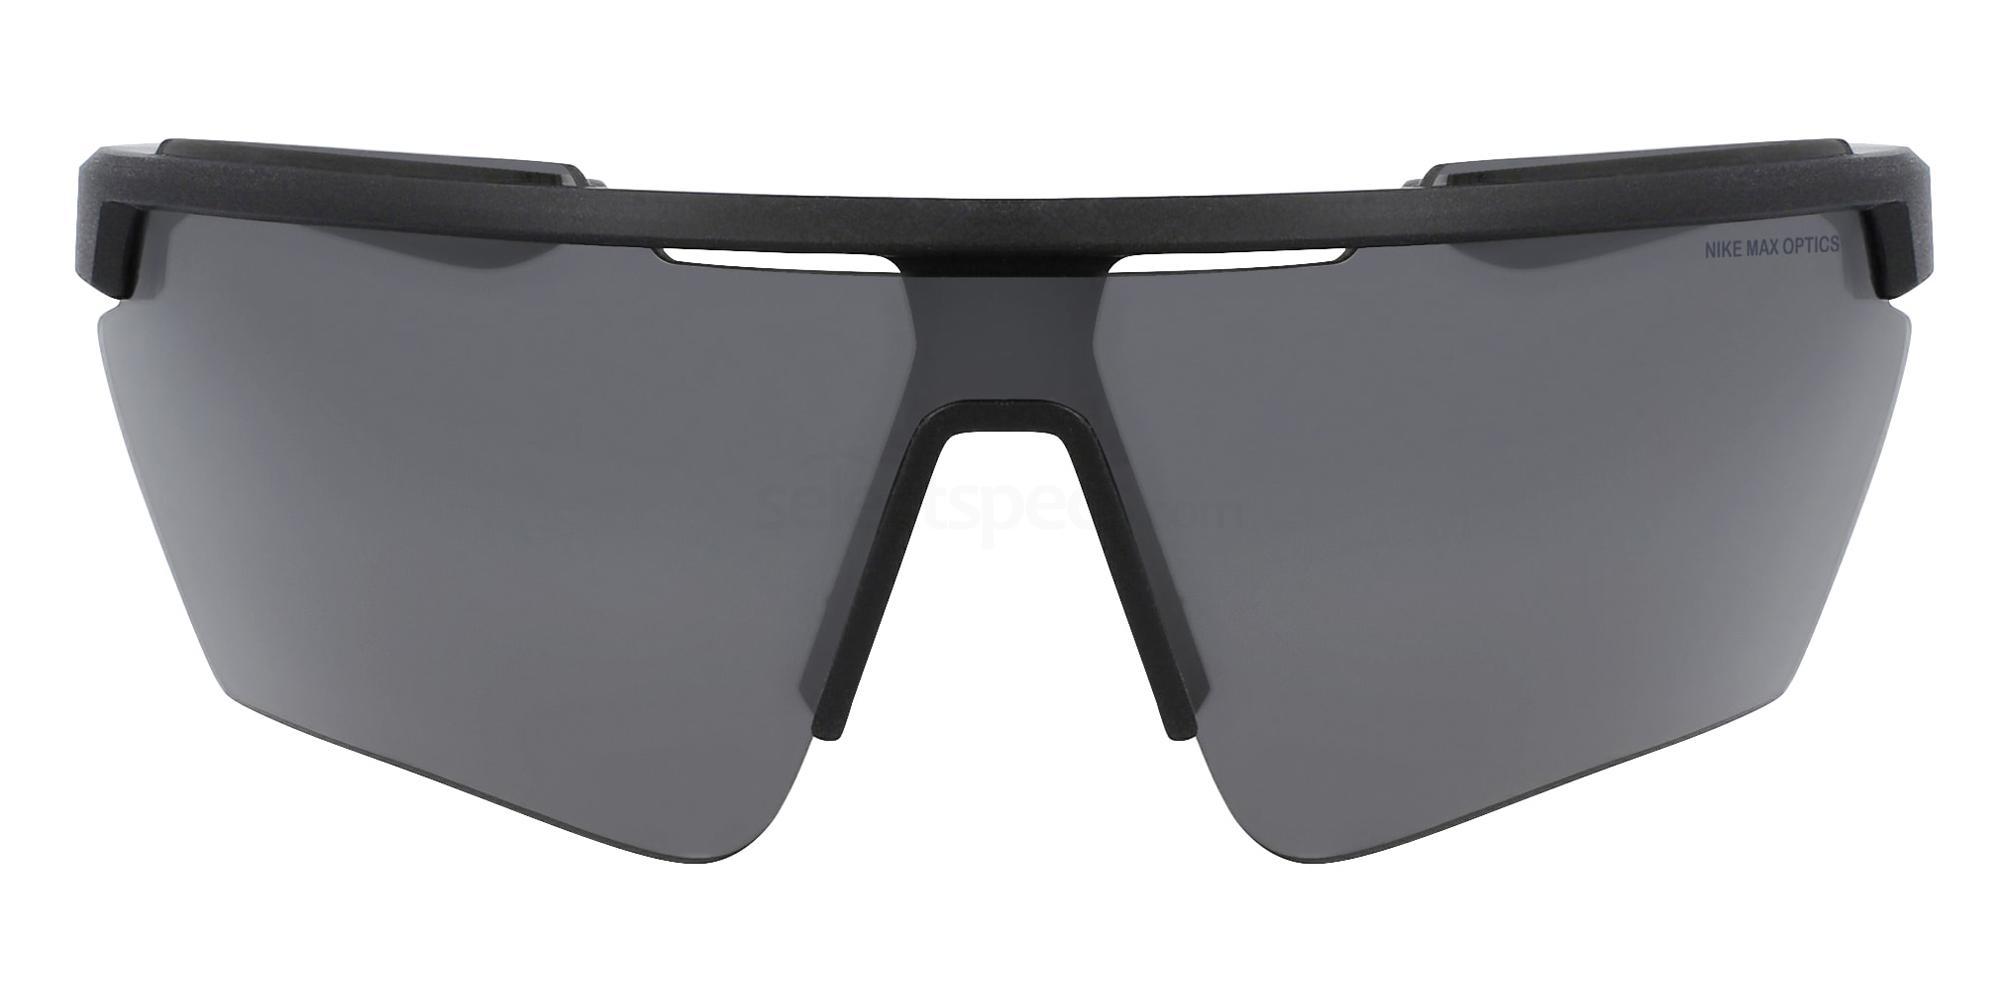 010 NIKE WNDSHLD ELITE PRO DC3388 Sunglasses, Nike